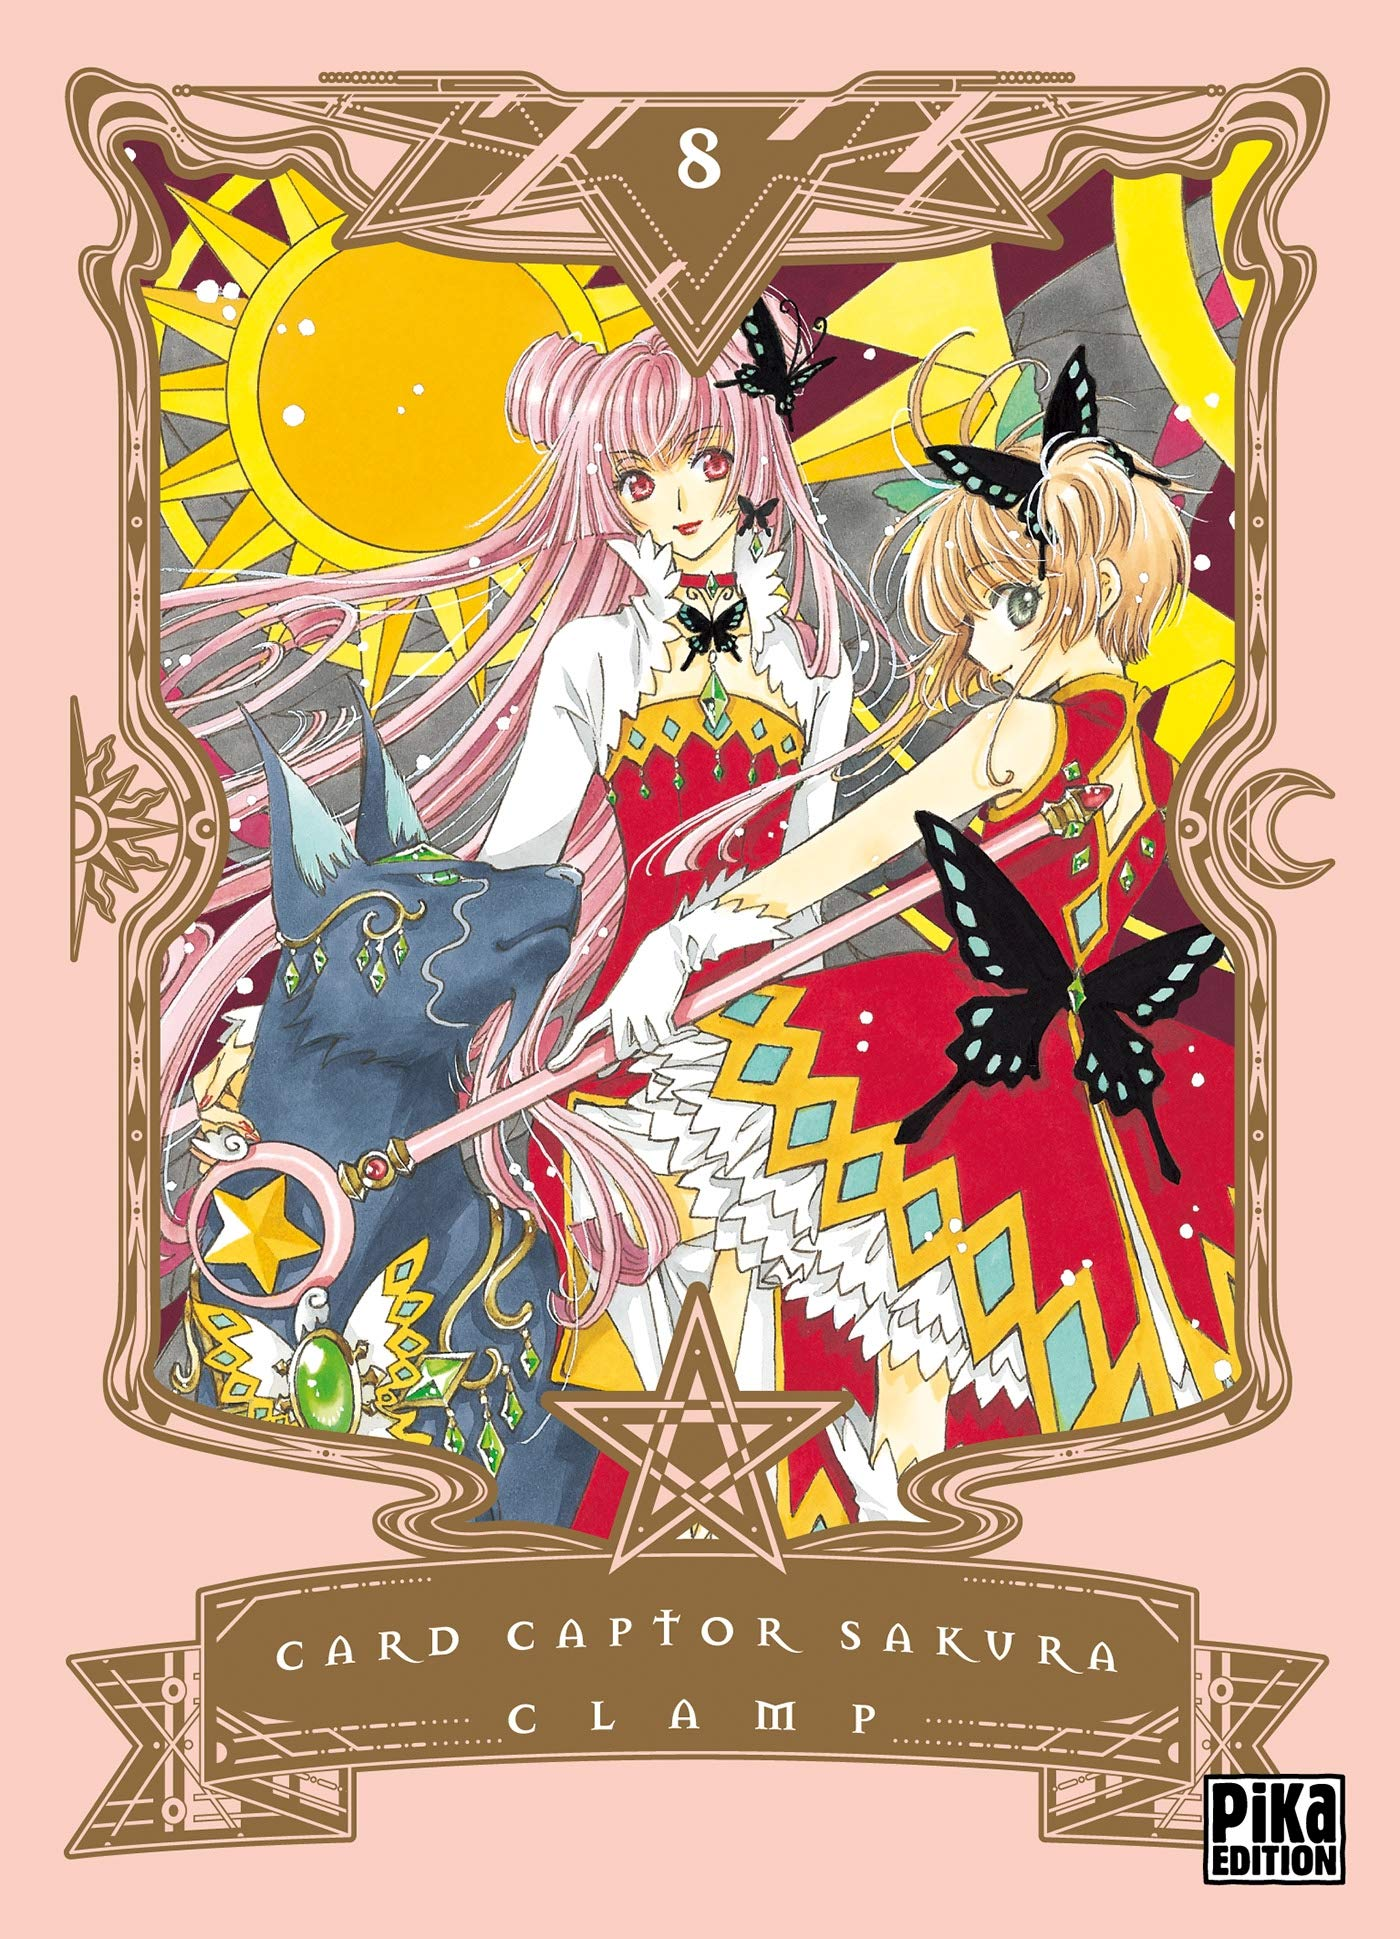 Card Captor Sakura 8